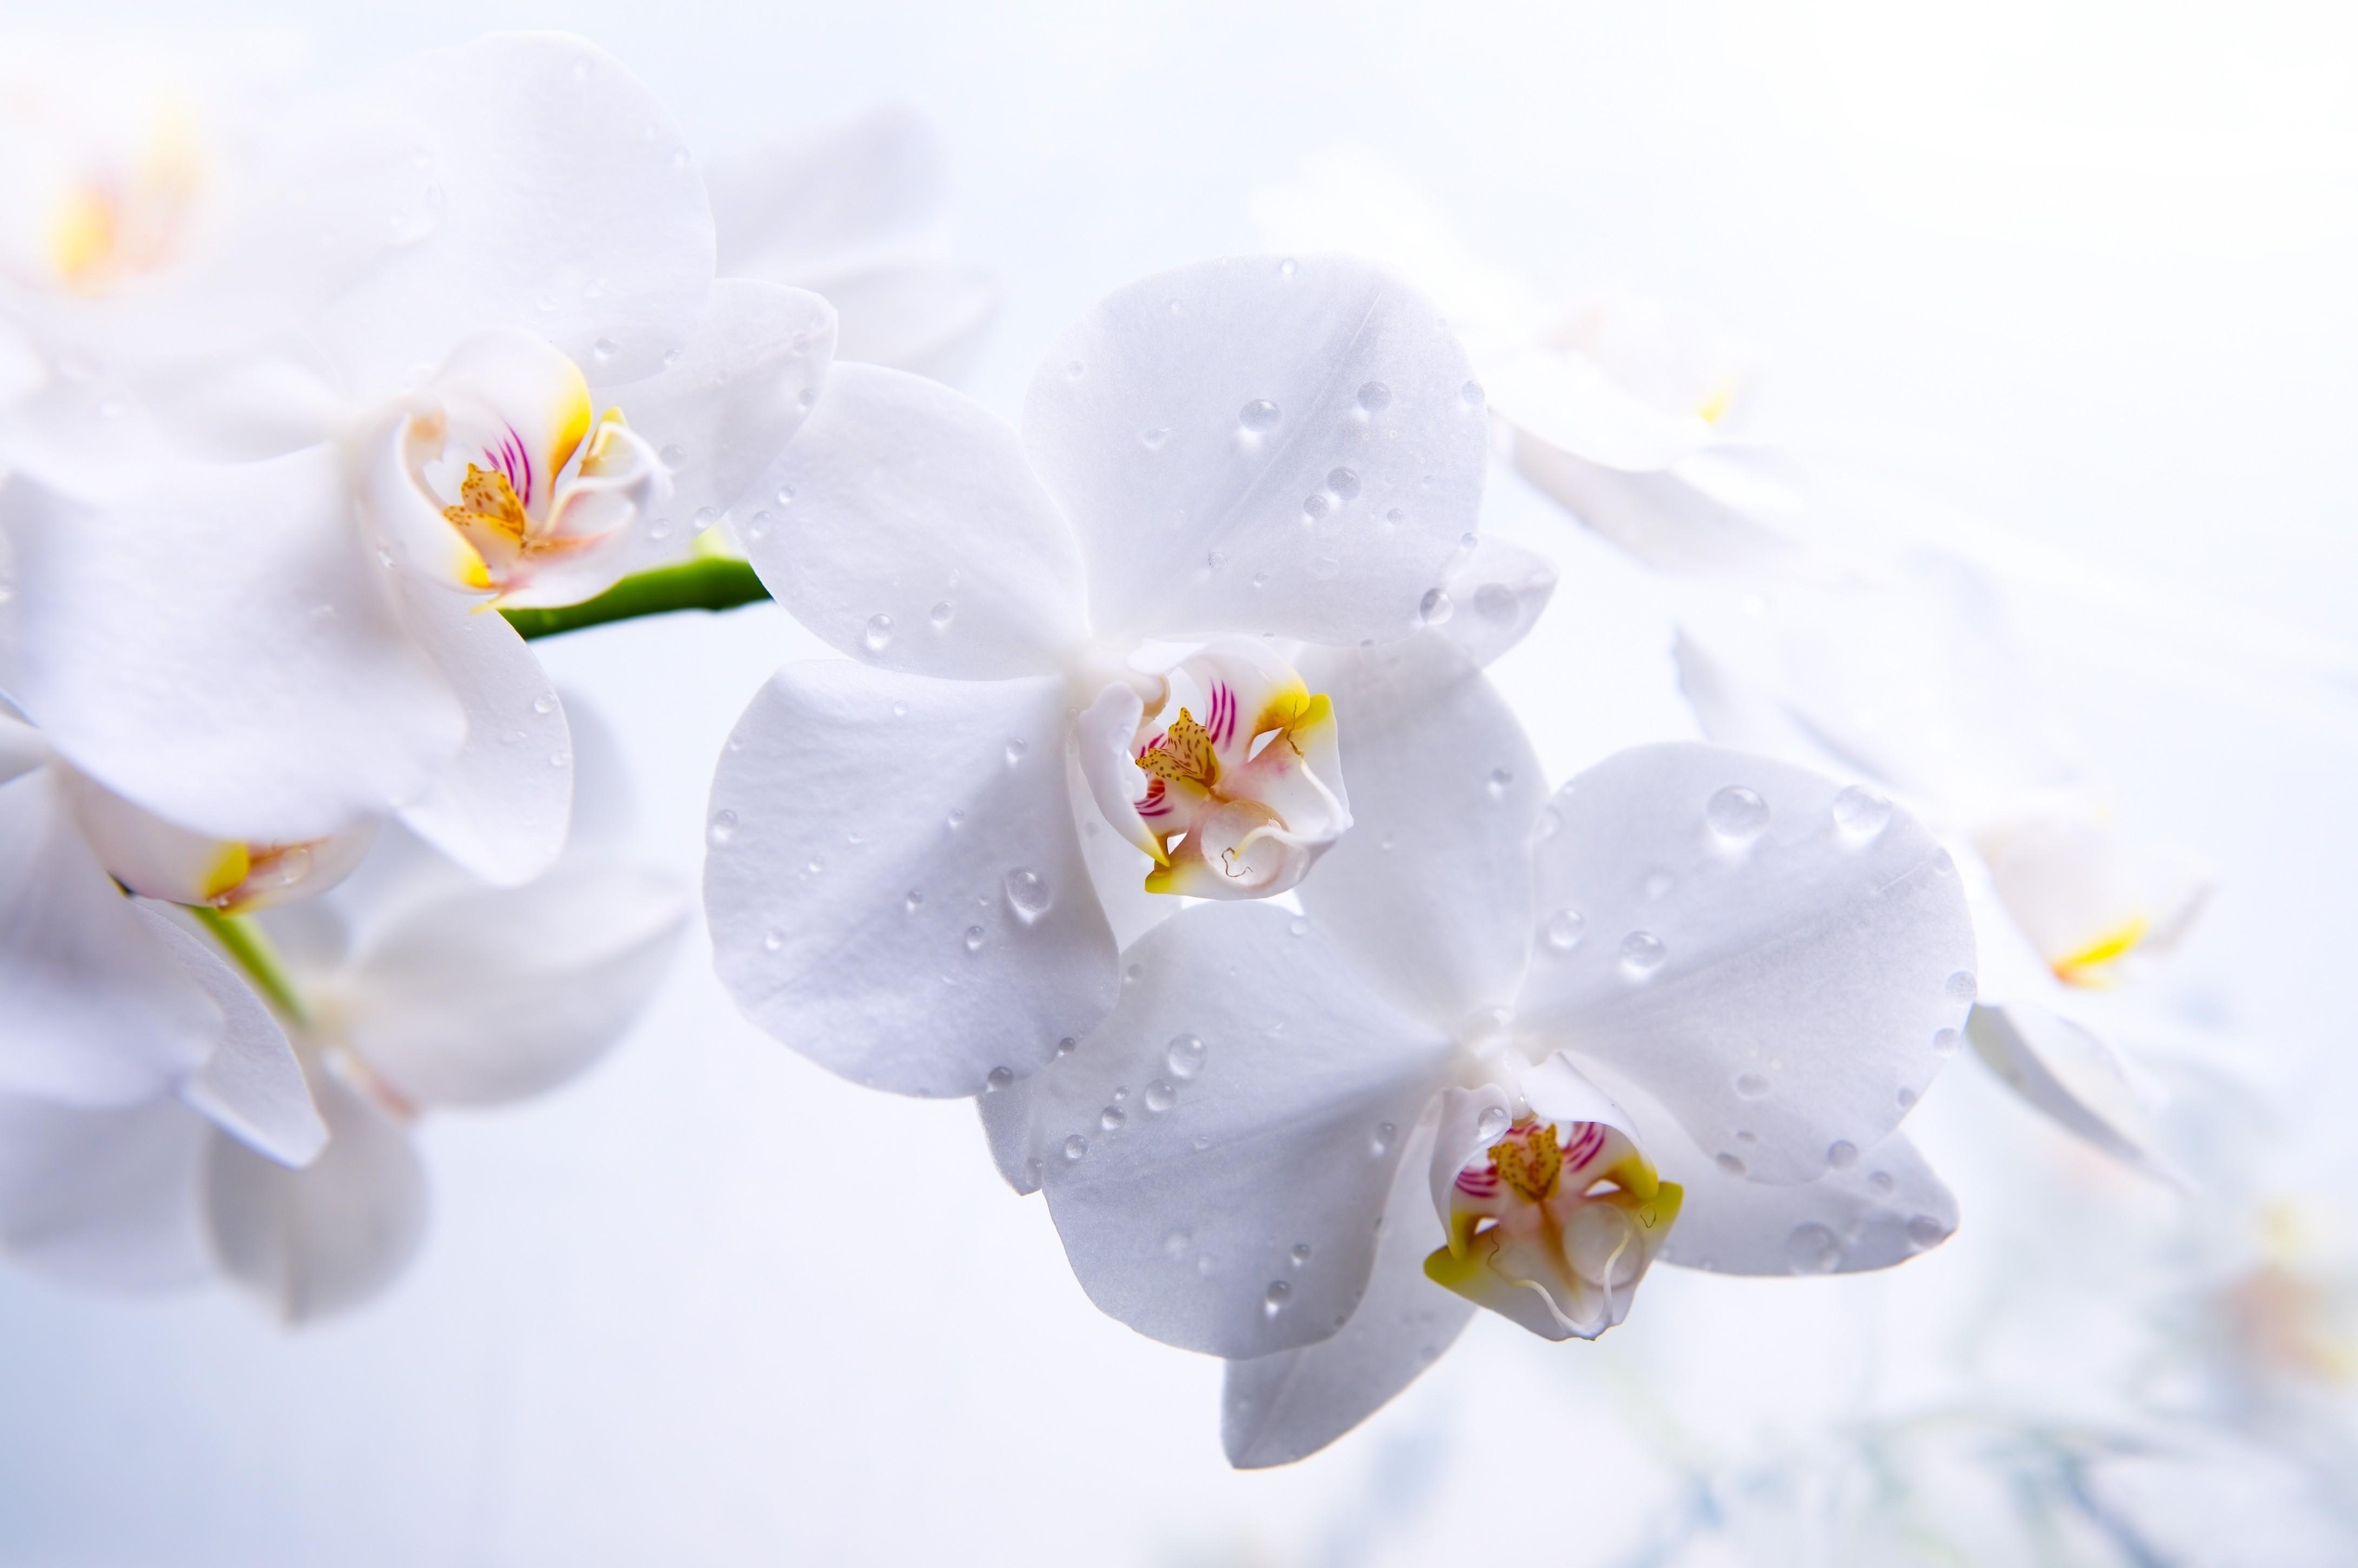 Картинки синие цветы - c778